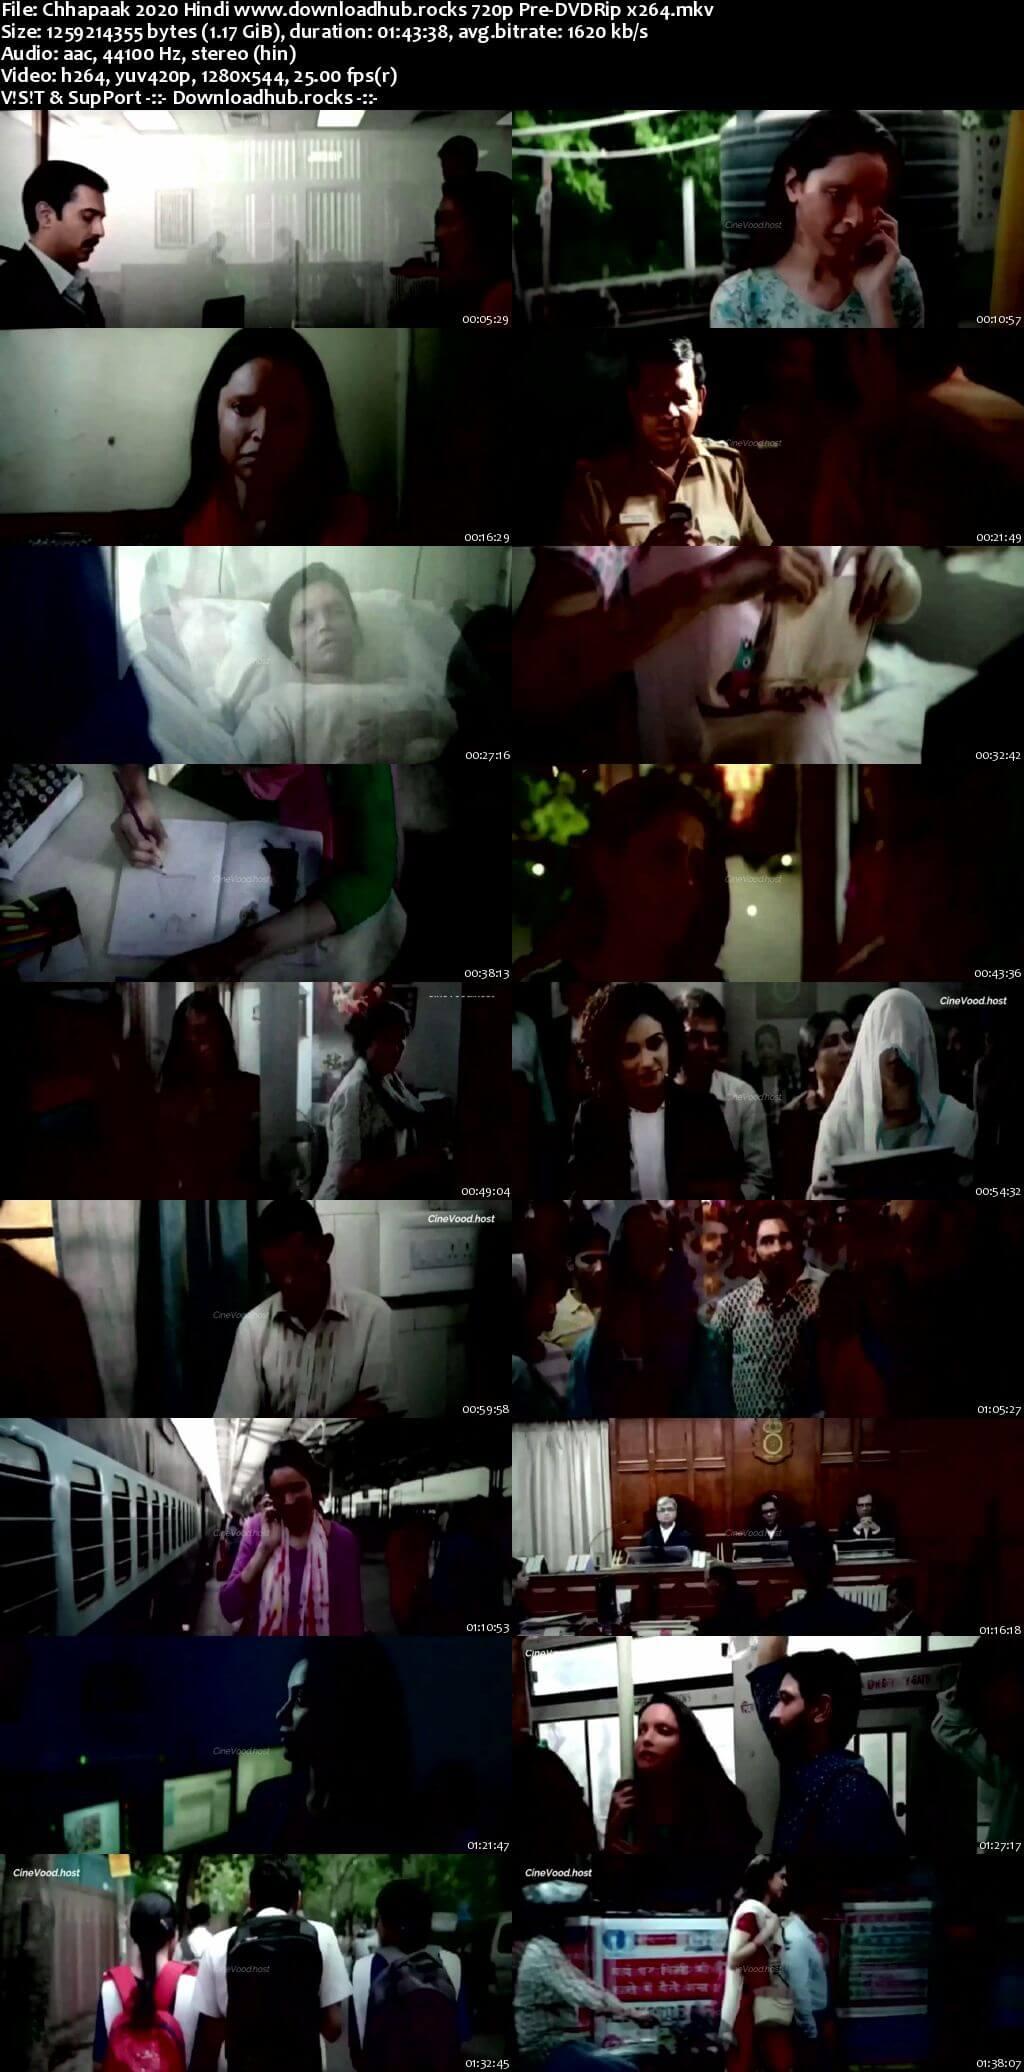 Chhapaak 2020 Hindi 720p 480p Pre-DVDRip x264